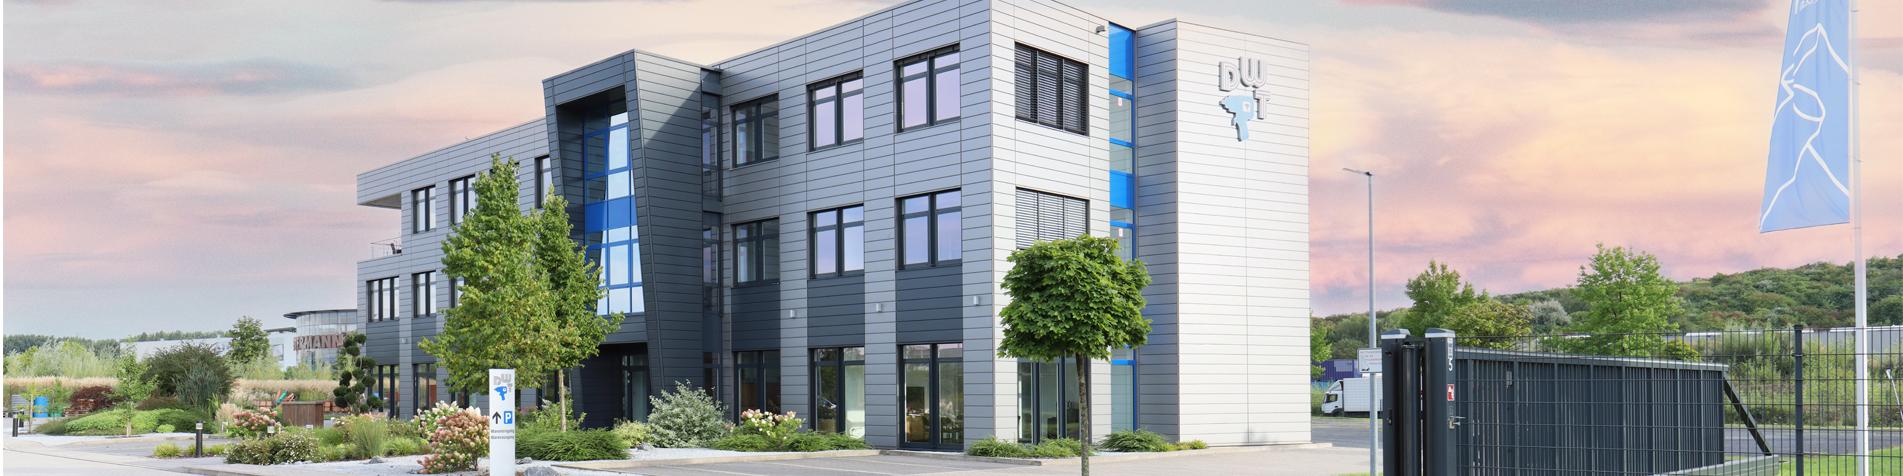 DWT GmbH